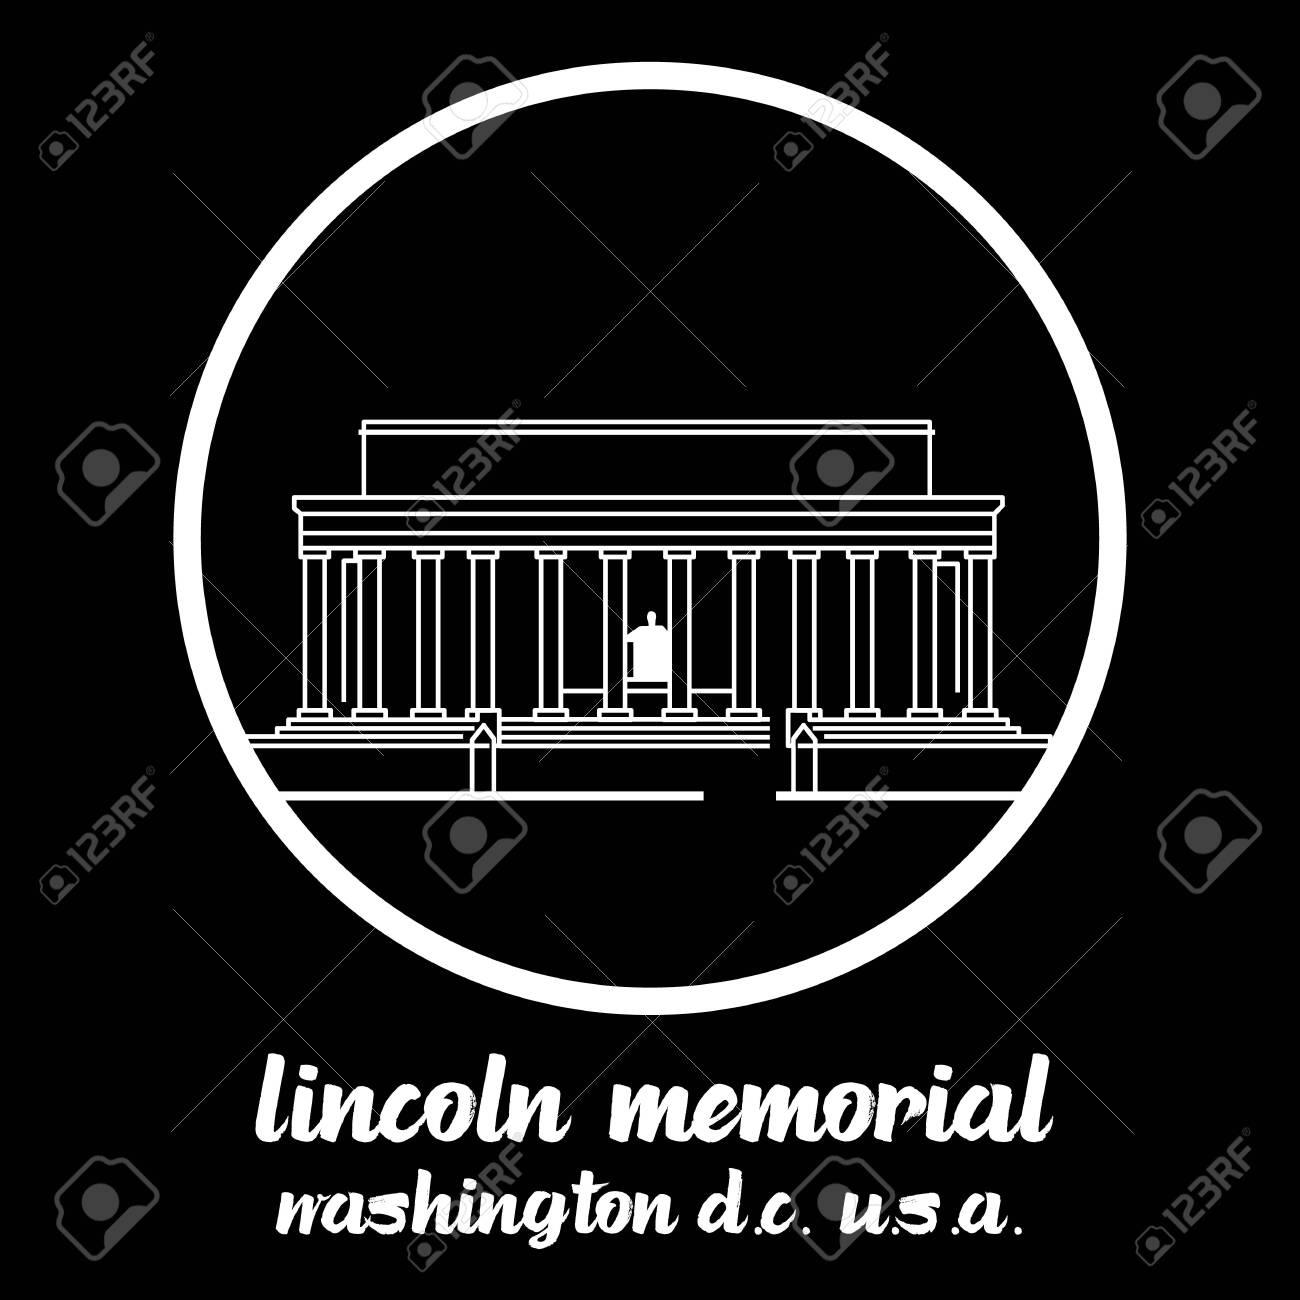 Circle Icon Lincoln Memorial. vector illustration - 133311385